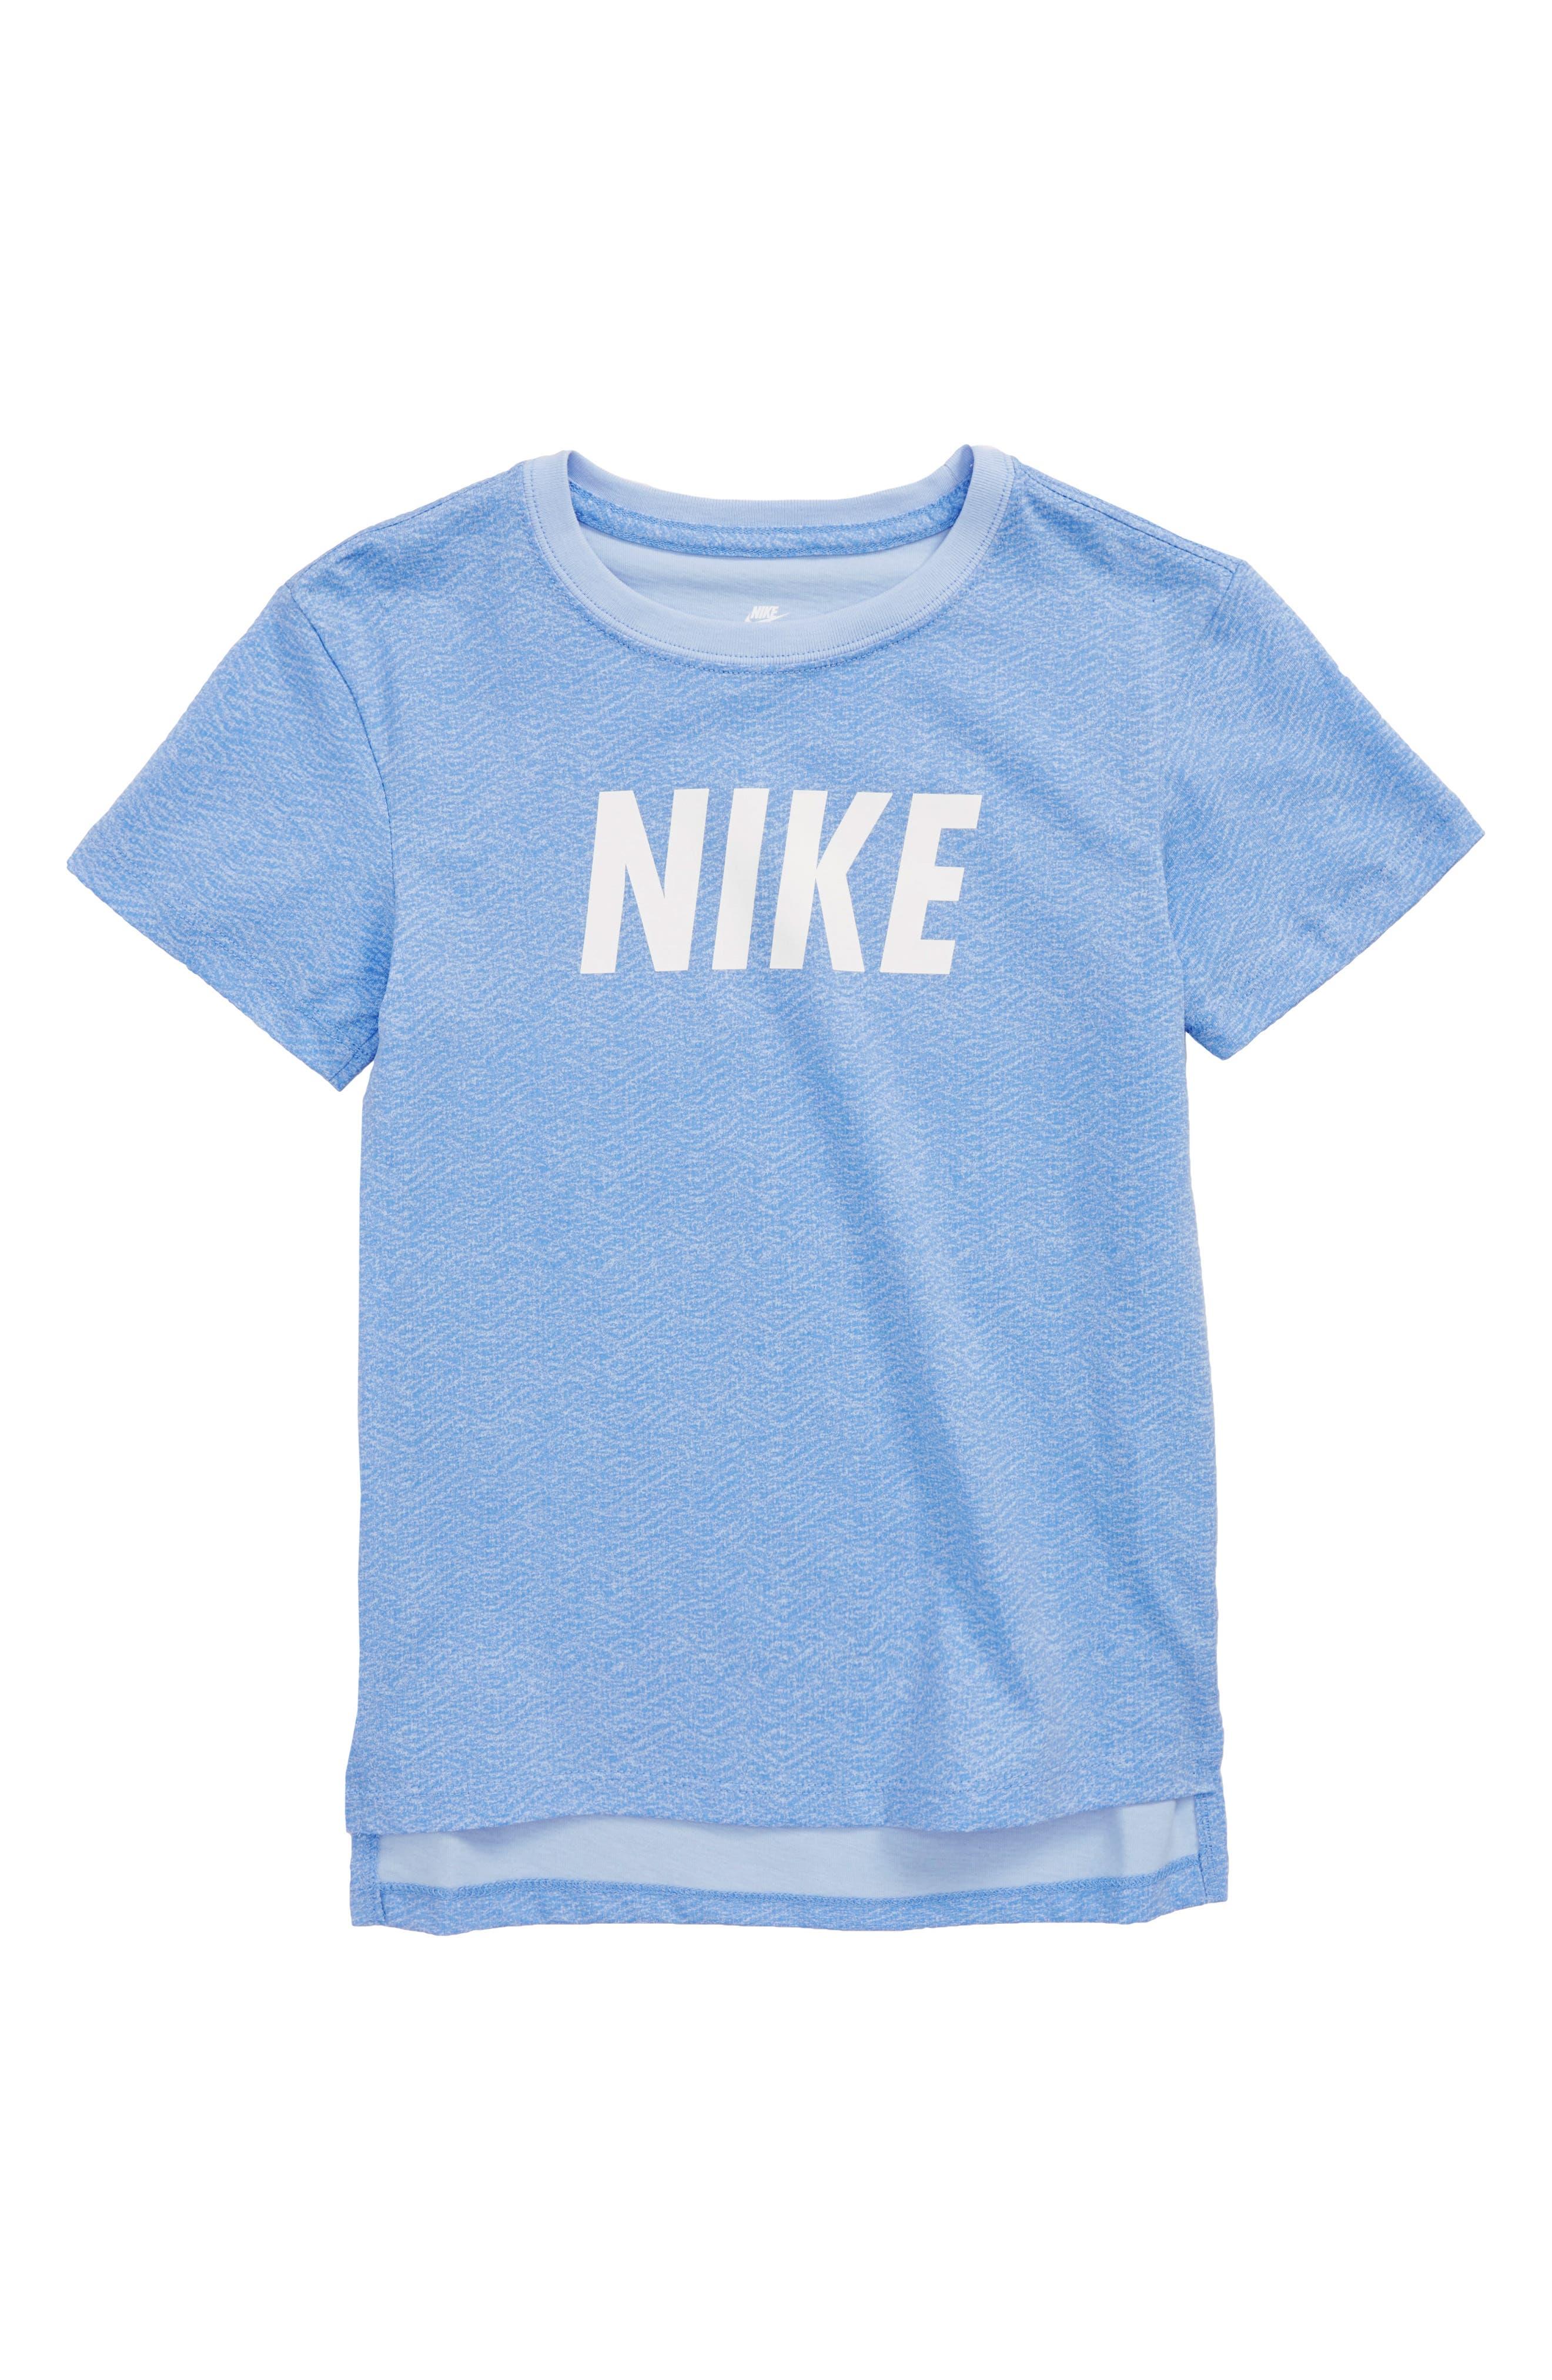 Sportswear Graphic Tee,                             Main thumbnail 1, color,                             415